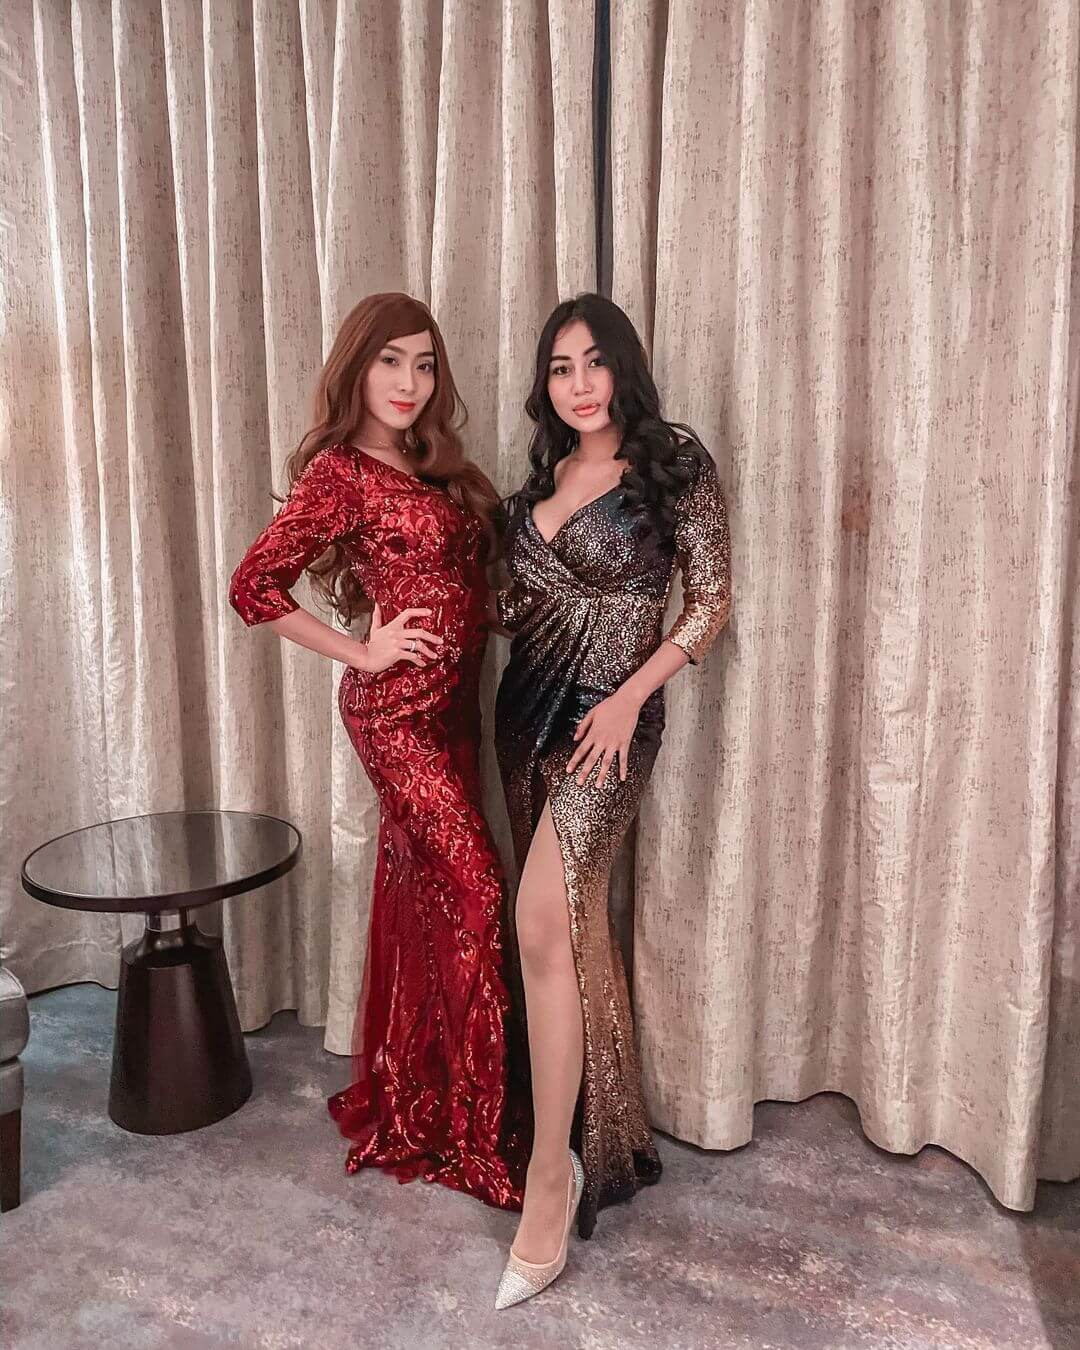 Model Pamela Safitri With Her Friend